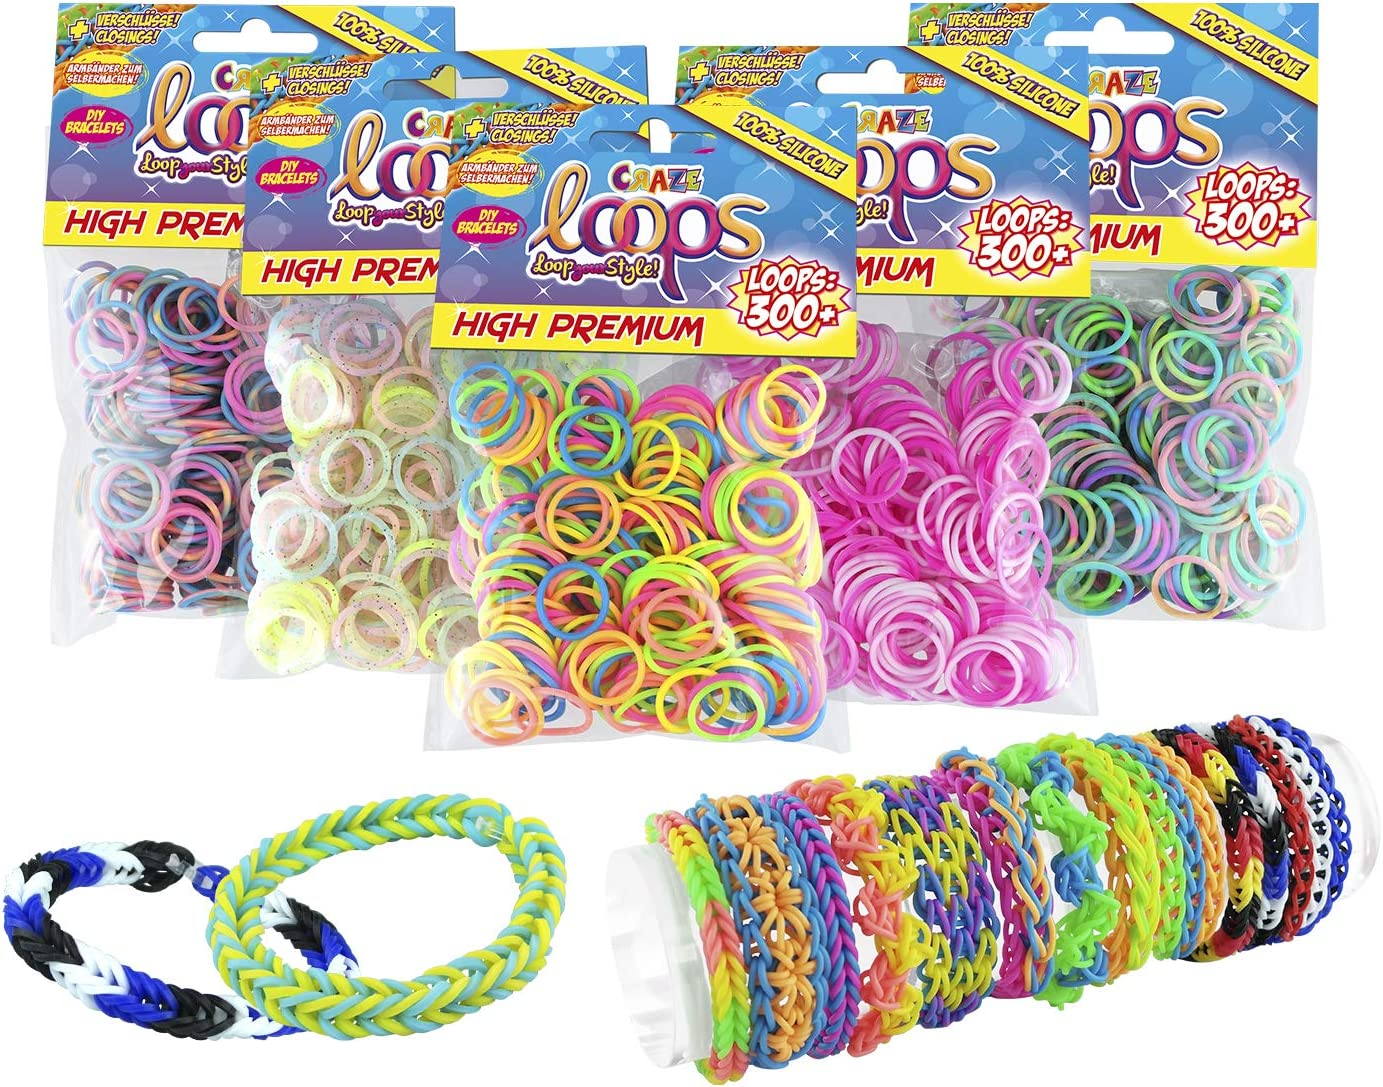 Craze 51147 - Juego de 300 anillos de silicona de colores prémium para pulsera, bandas de silicona, goma Mega US-Trend 51147, multicolor , color/modelo surtido